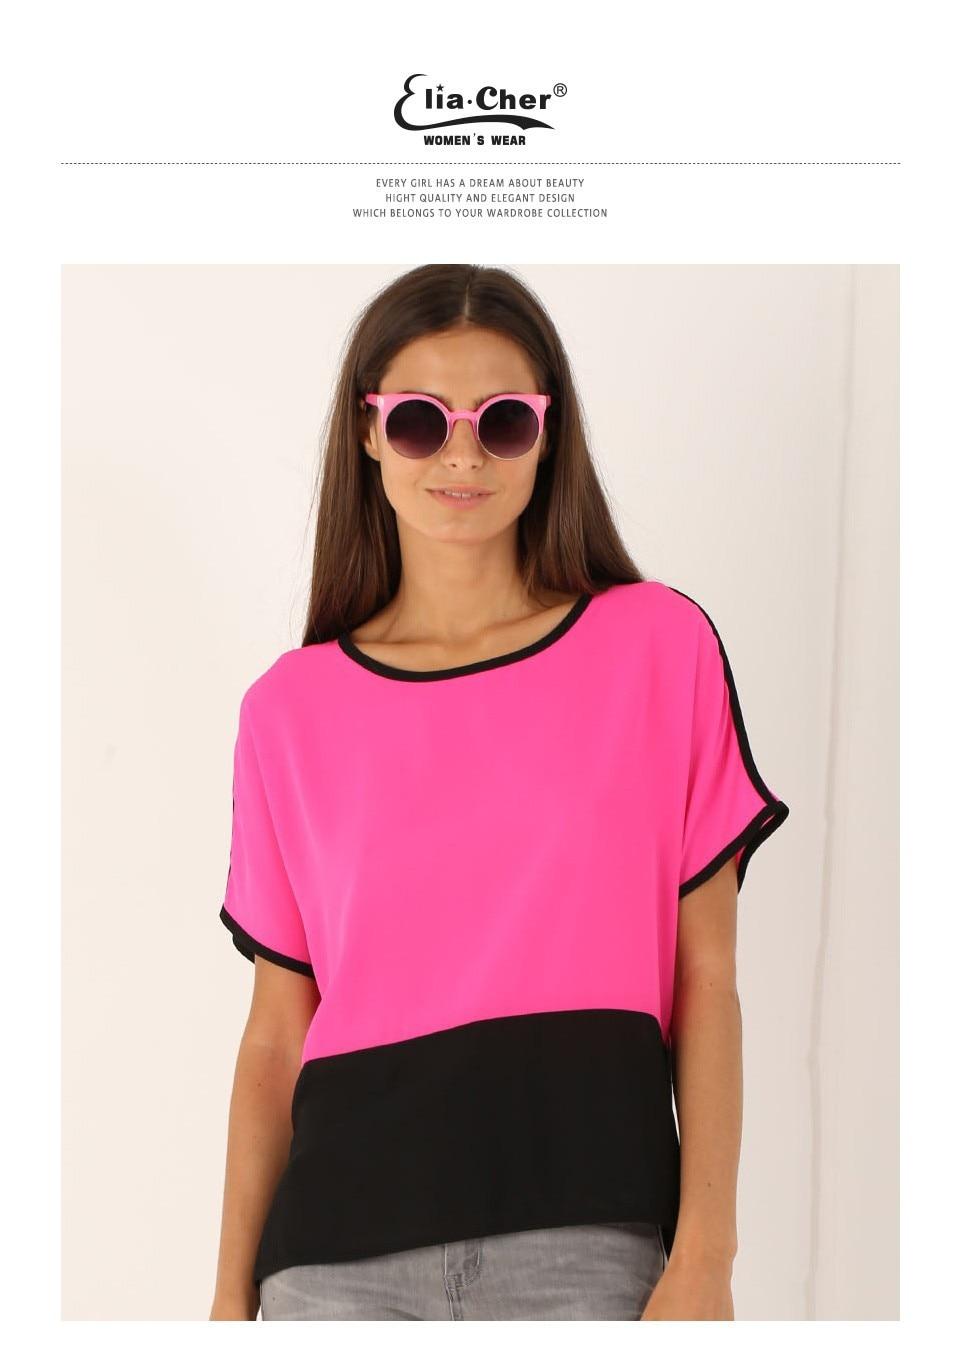 8a2edb16436cc Blouse Women Tops Women Blouse Eliacher Brand Plus Size Casual Women  pullovers Clothing Lady Shirts Blusas Women Top